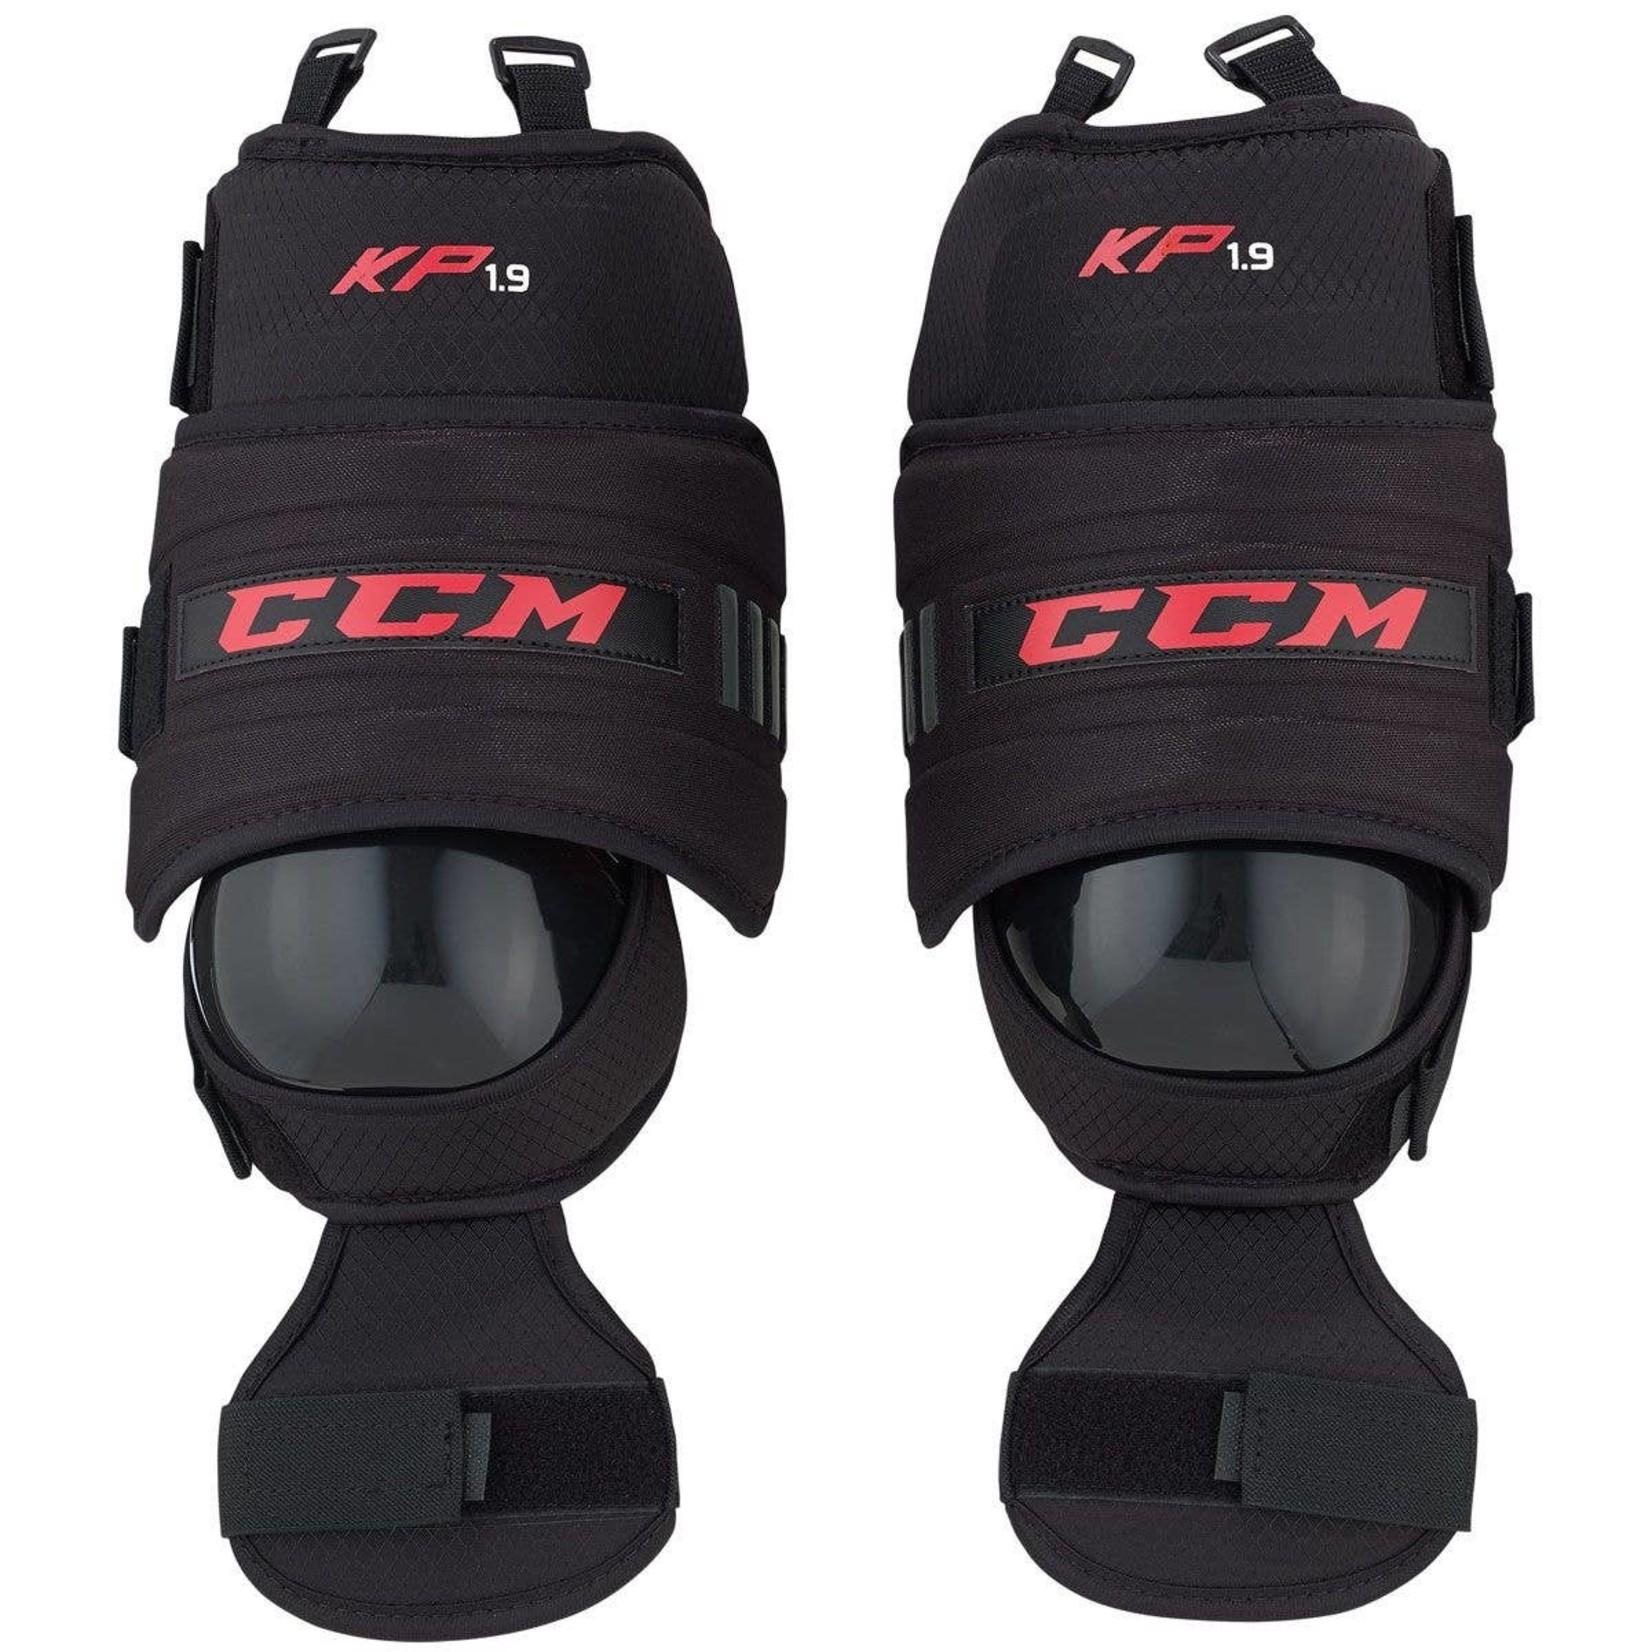 CCM CCM Goal Knee Protector, 1.9, Intermediate